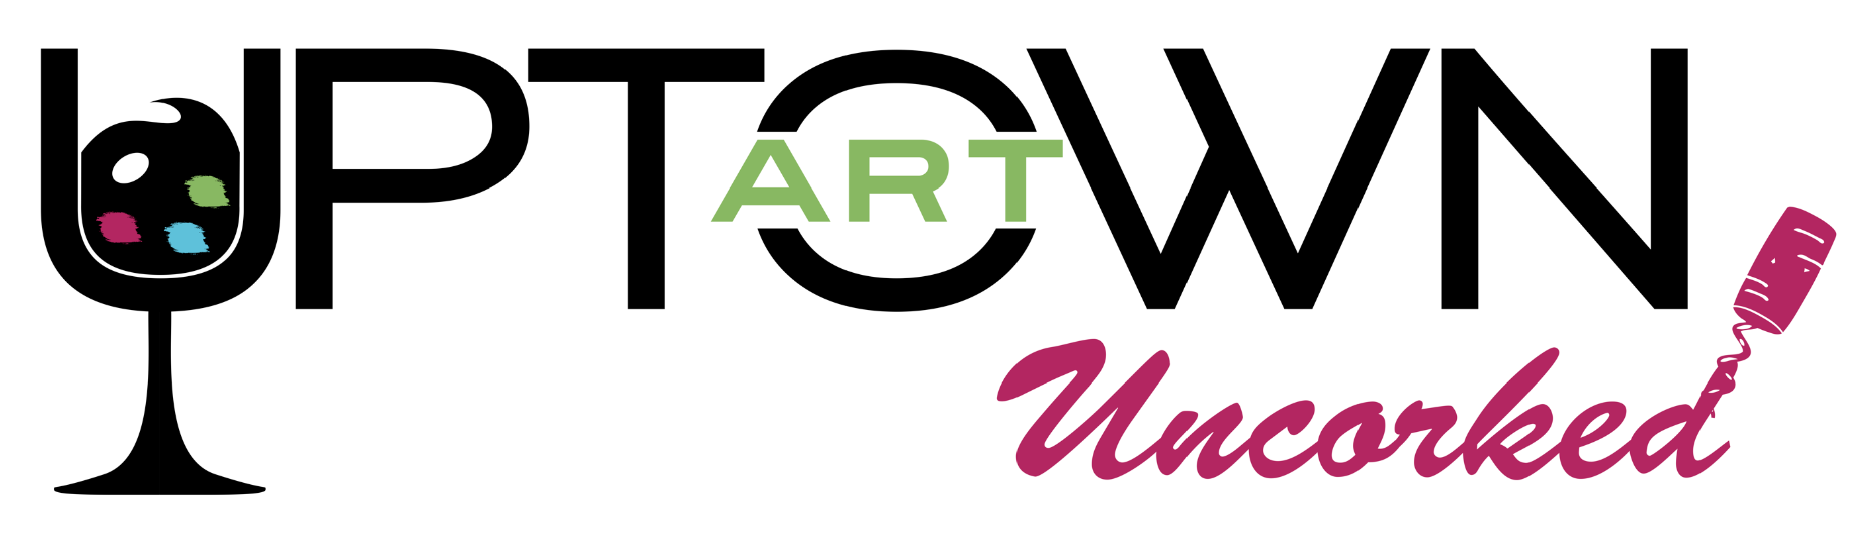 Uptown Art Calendar Hendersonville Tn : Uptown art uncorked celebrates its year anniversary and